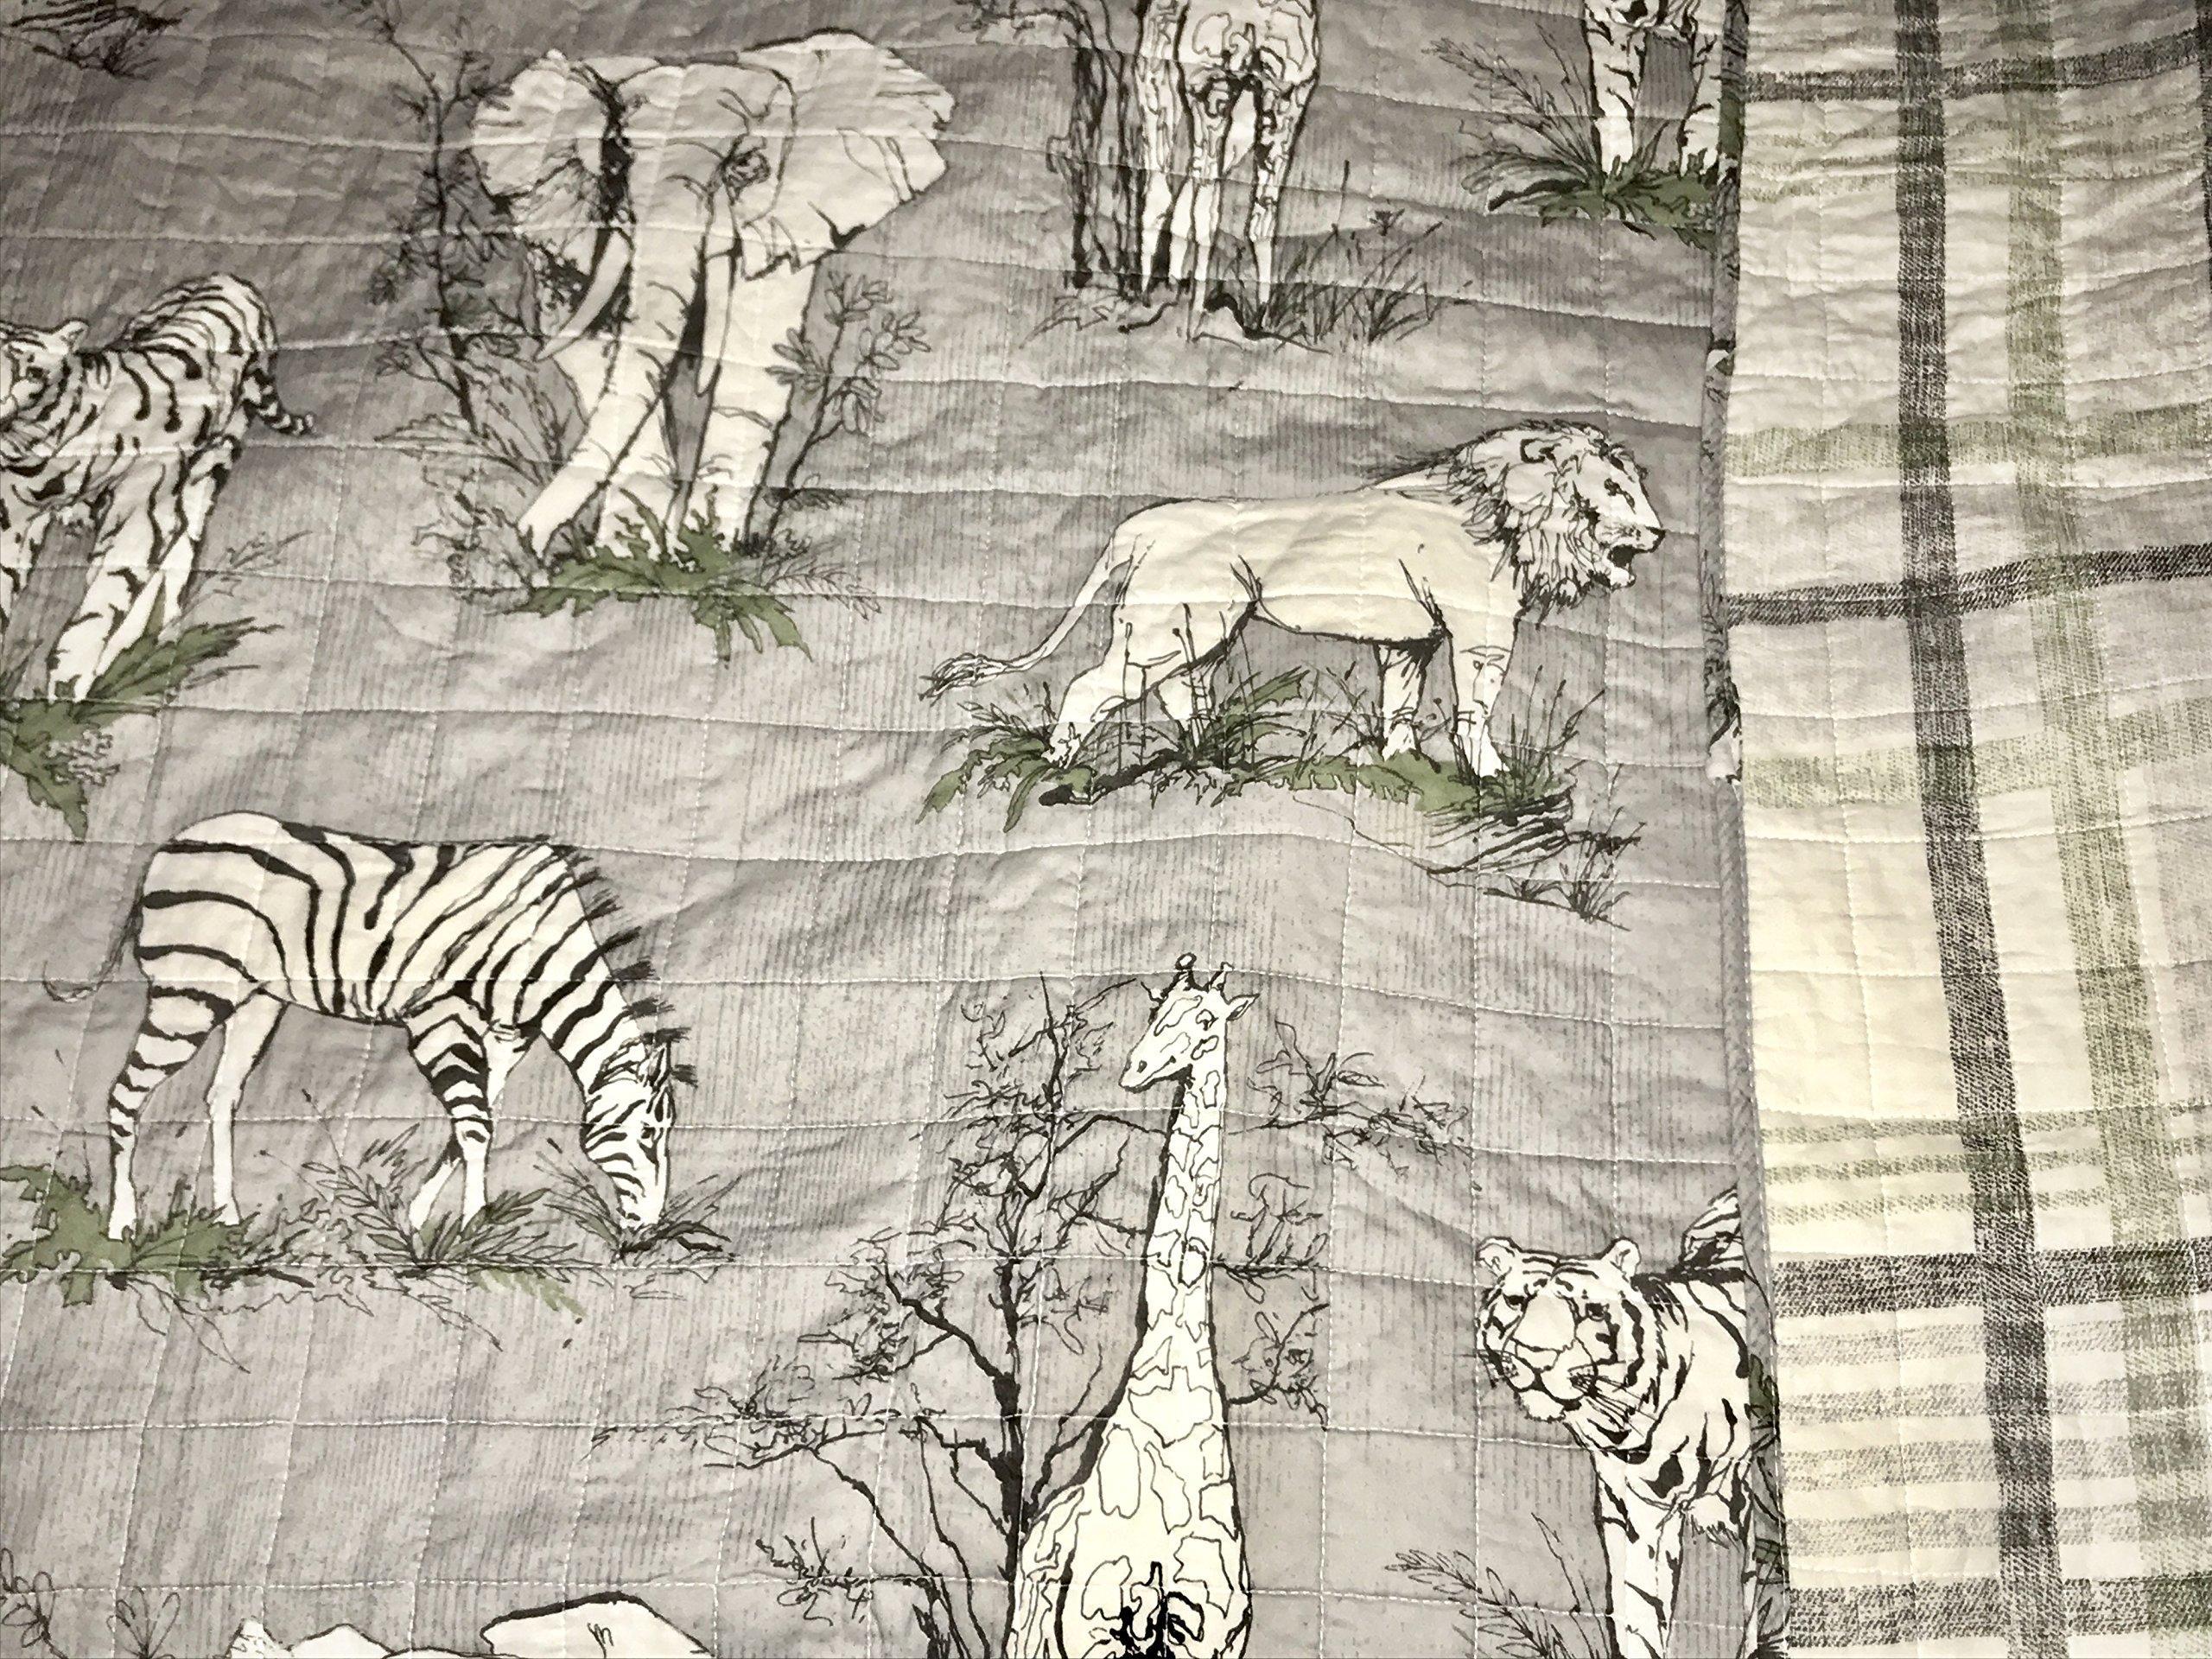 5-pc SAFARI JUNGLE FULL/QUEEN Quilt Set - (set includes 2 shams, 2 pillows & Quilt) lion elephant zebra tiger giraffe JUNGLE ANIMALS